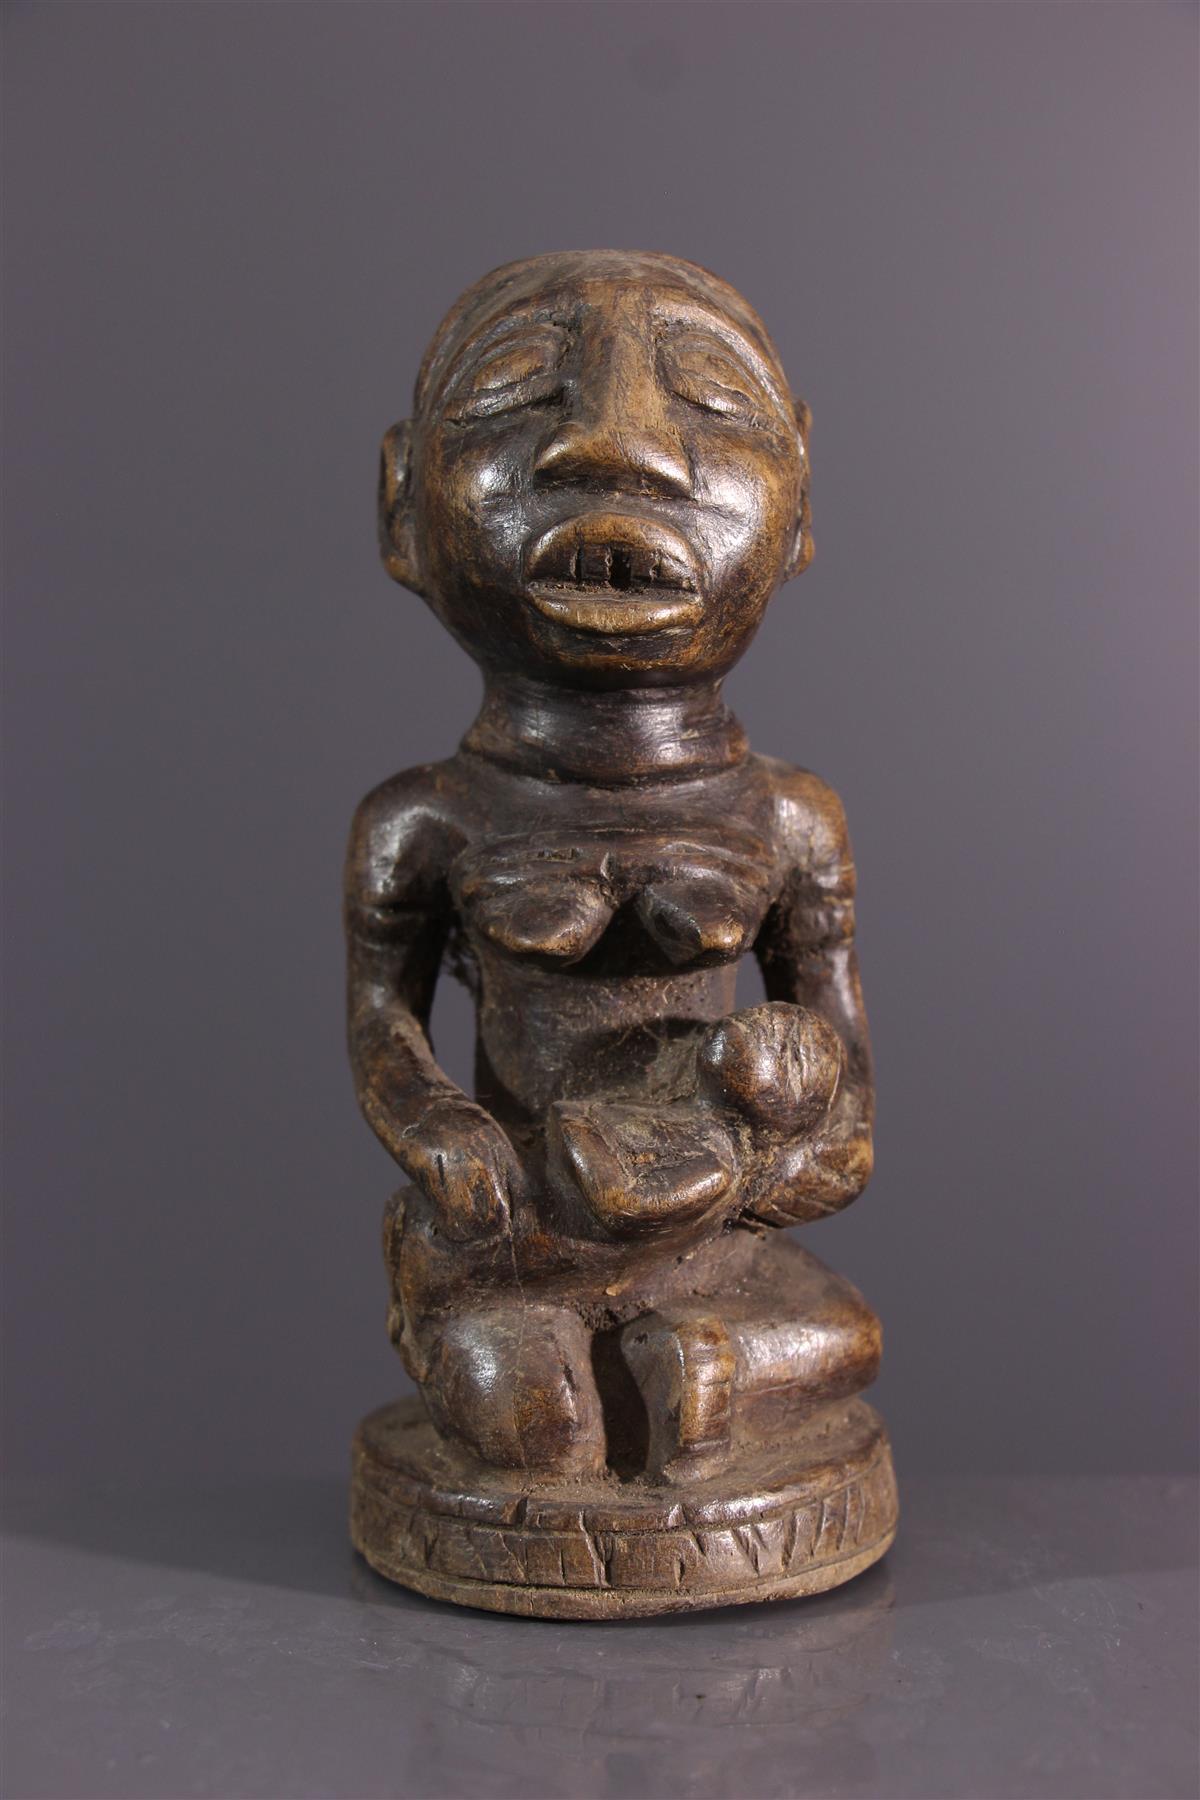 Statuette Pfemba - Art africain